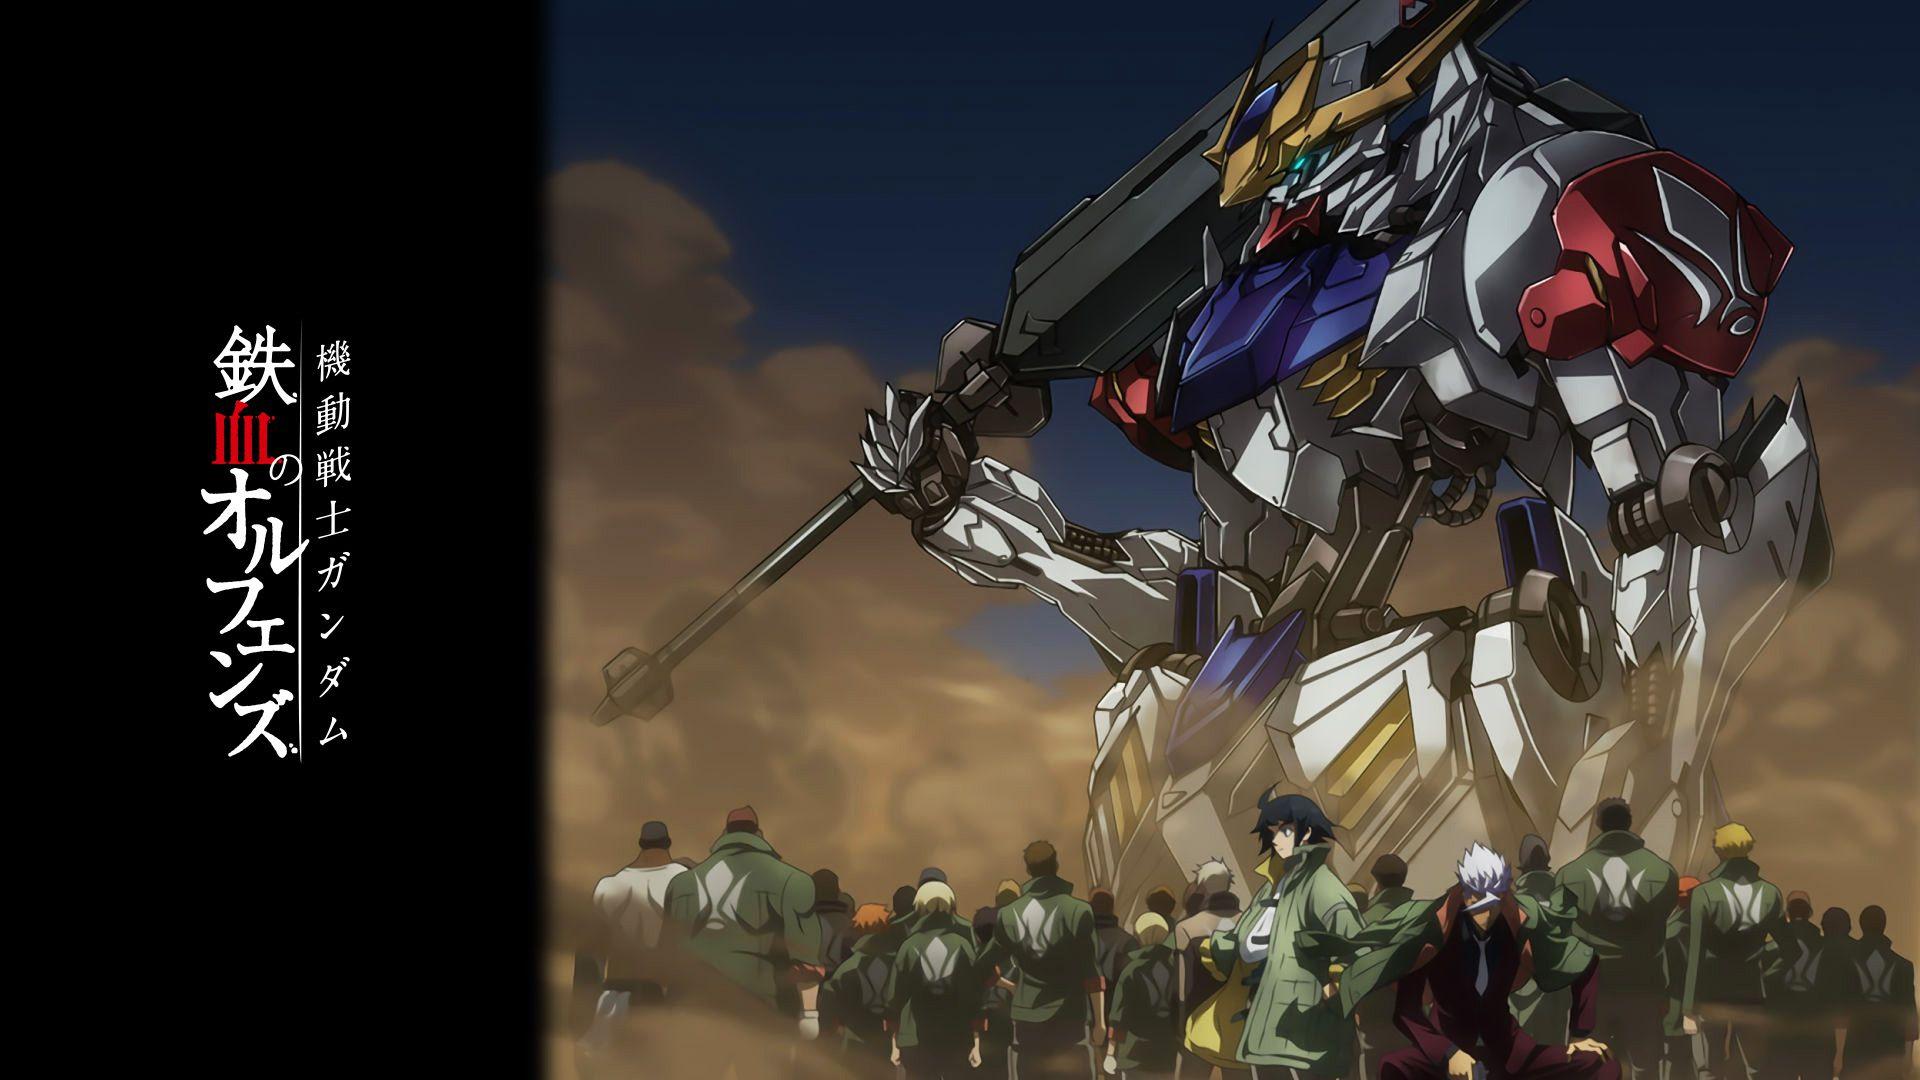 http://anihonetwallpaper.com/image/2016/10/37588-Gundam_Tekketsu_no_Orphans-PC.jpg